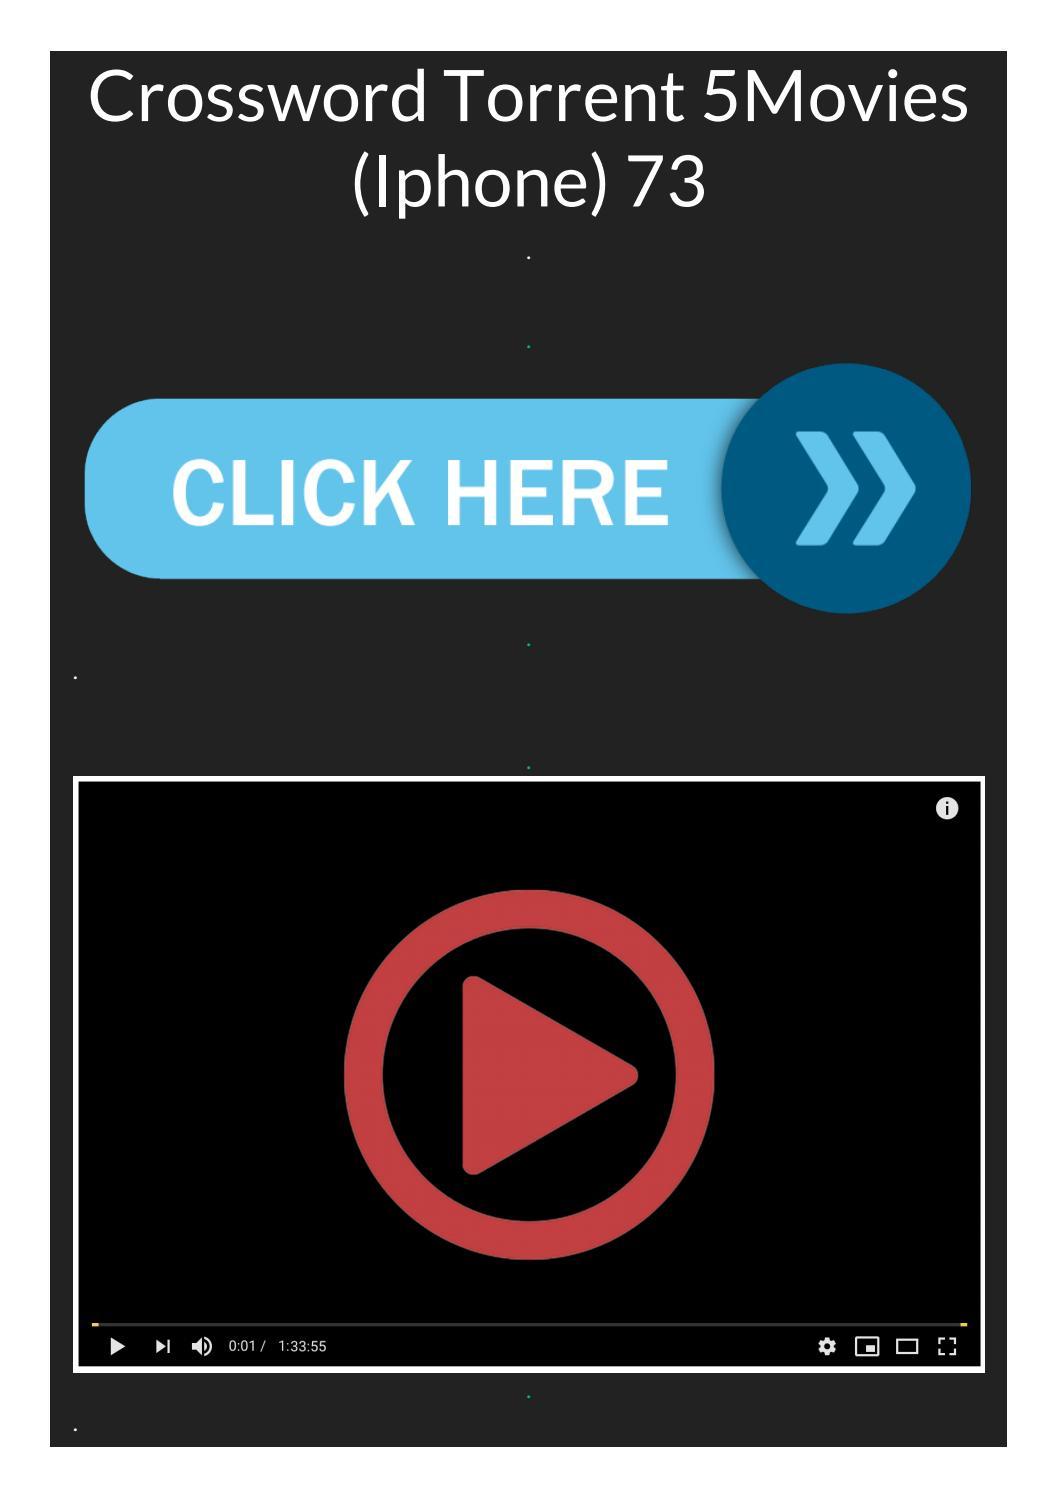 Crossword Torrent 5Movies (Iphone) 73Inlinadi - Issuu - Daily Printable Universal Crossword